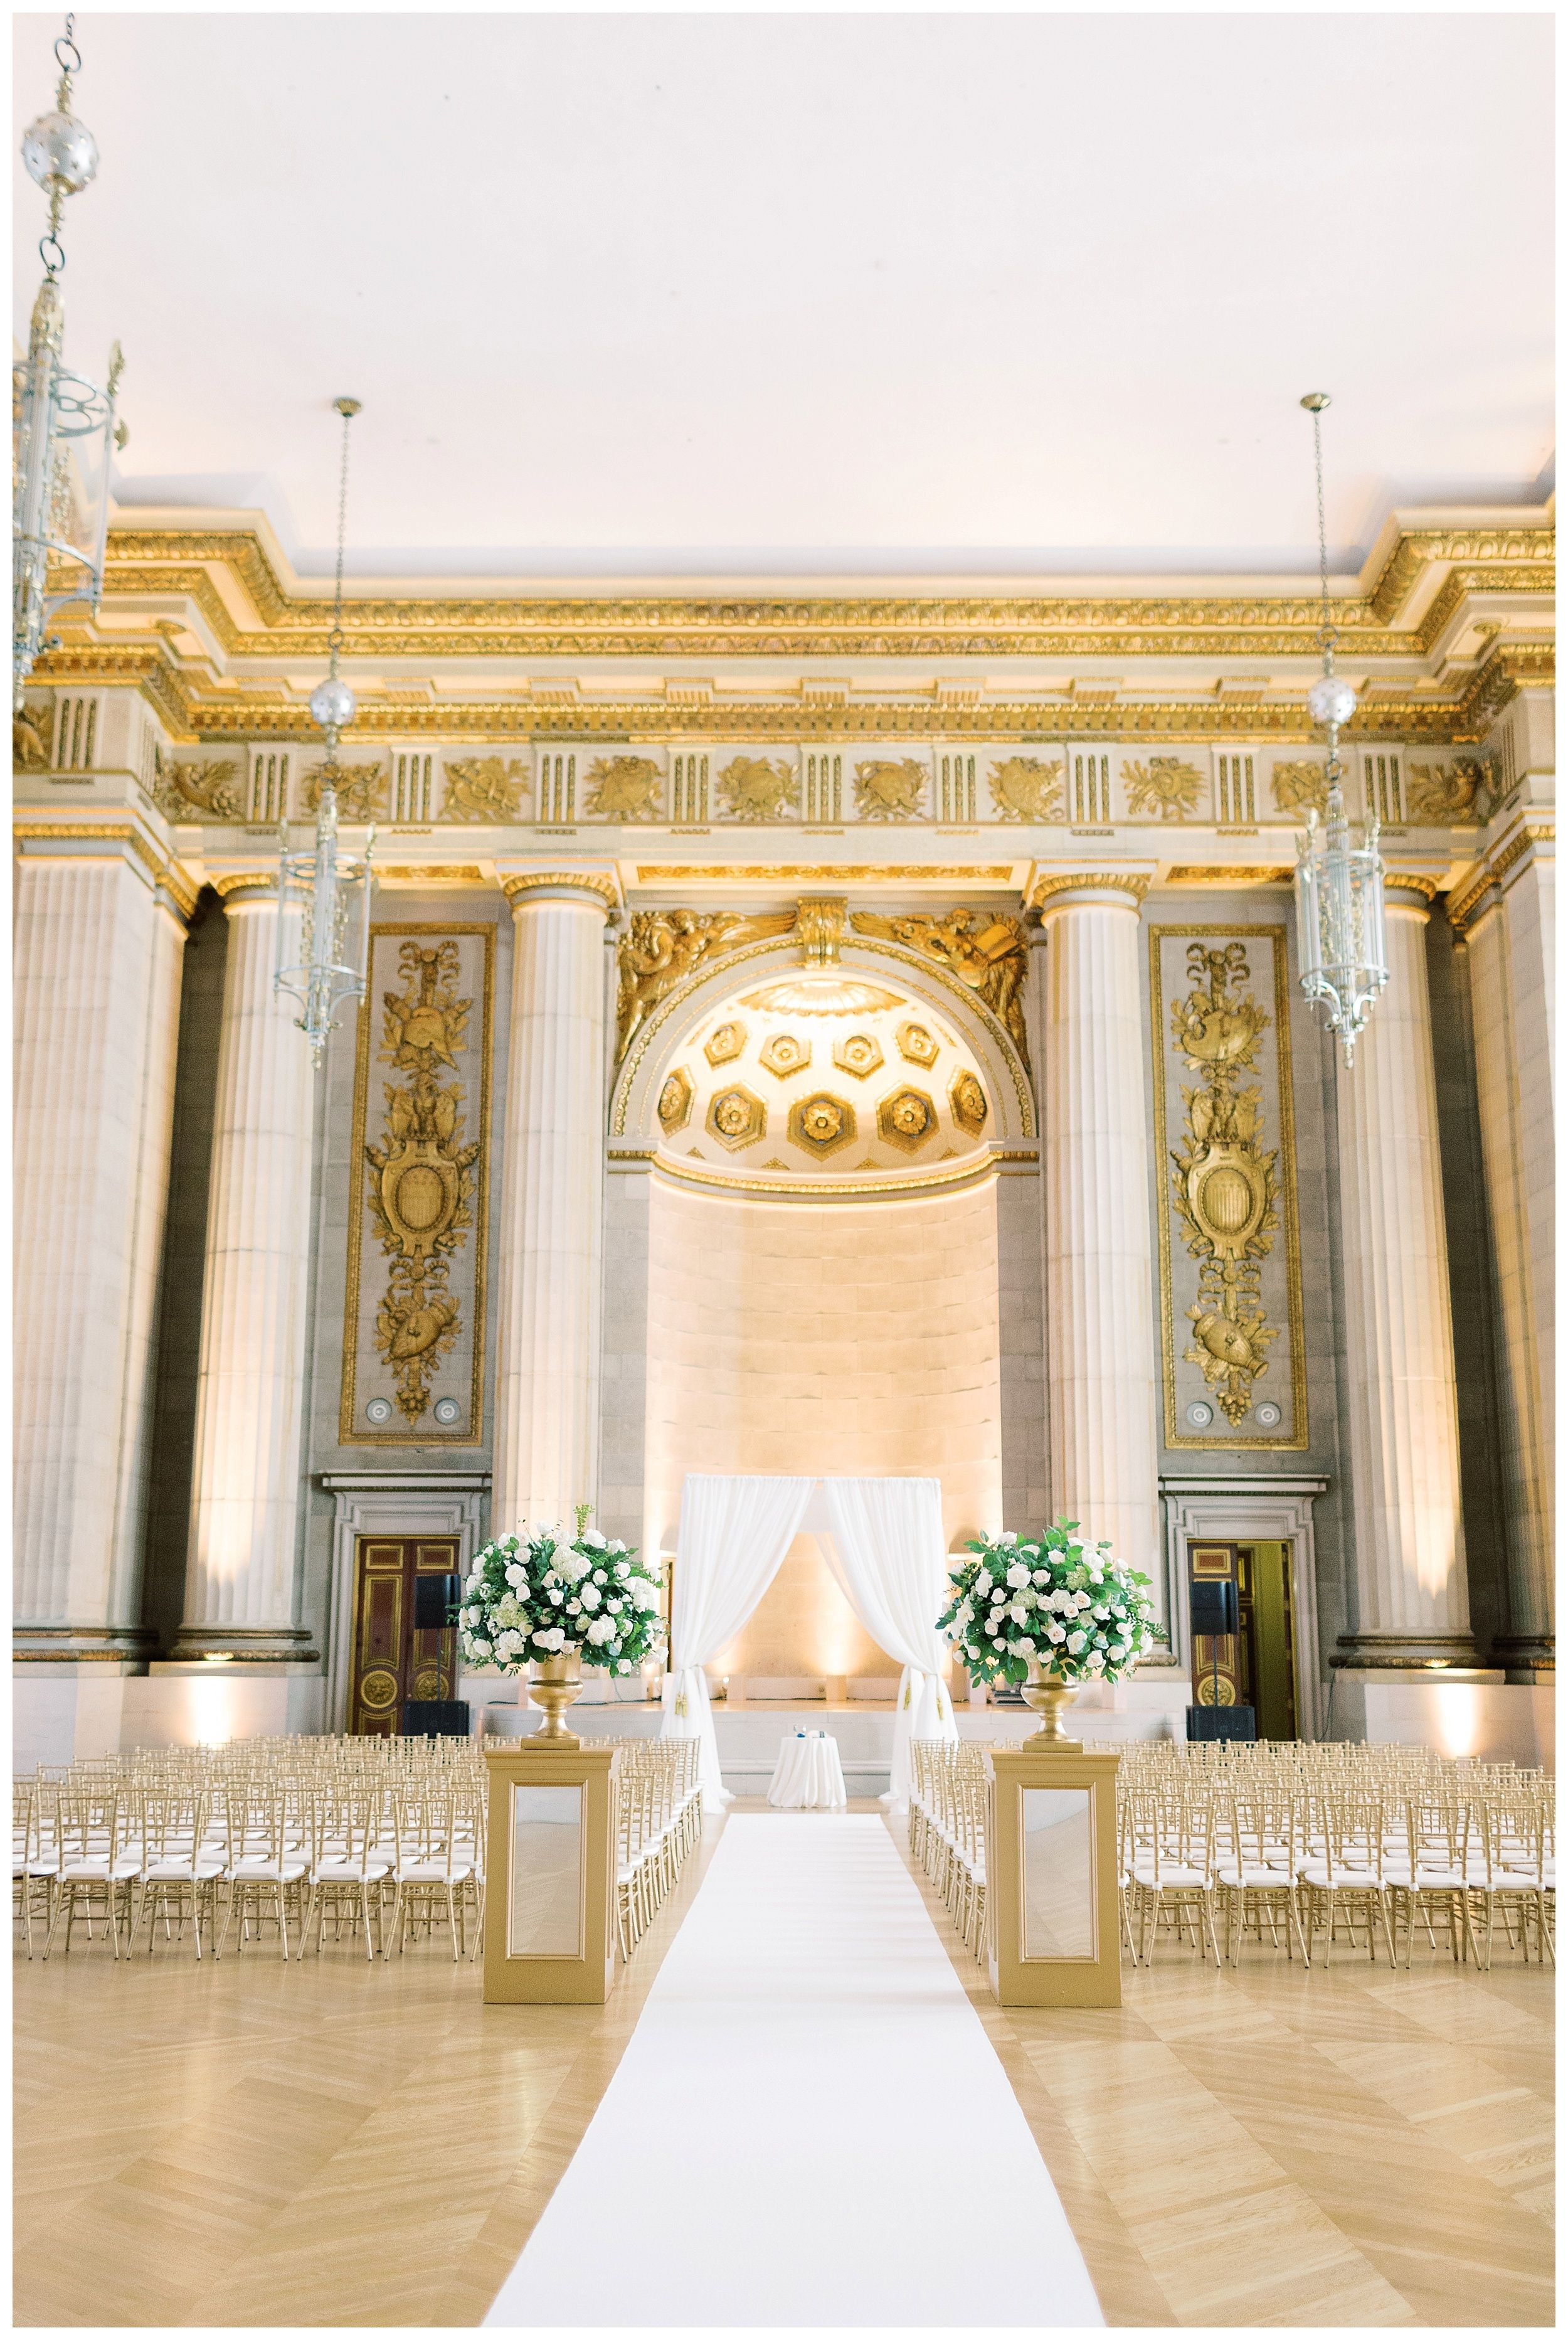 Andrew mellon auditorium wedding indoor wedding